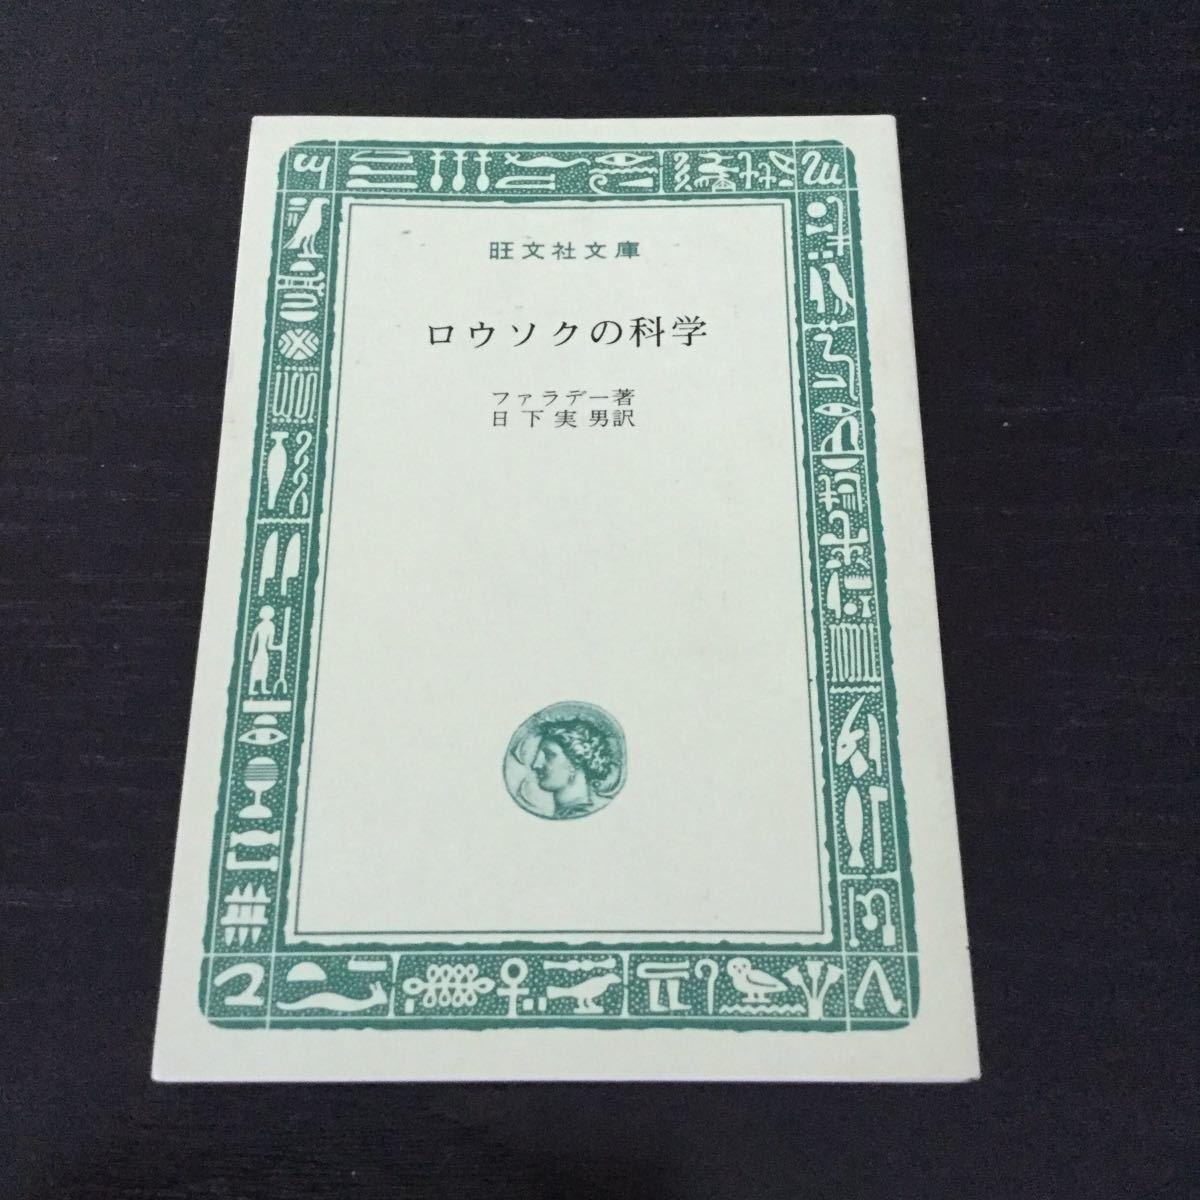 a37 ロウソクの科学 ファラデー 日下実男 小説 旺文社文庫 旺文社 _画像2